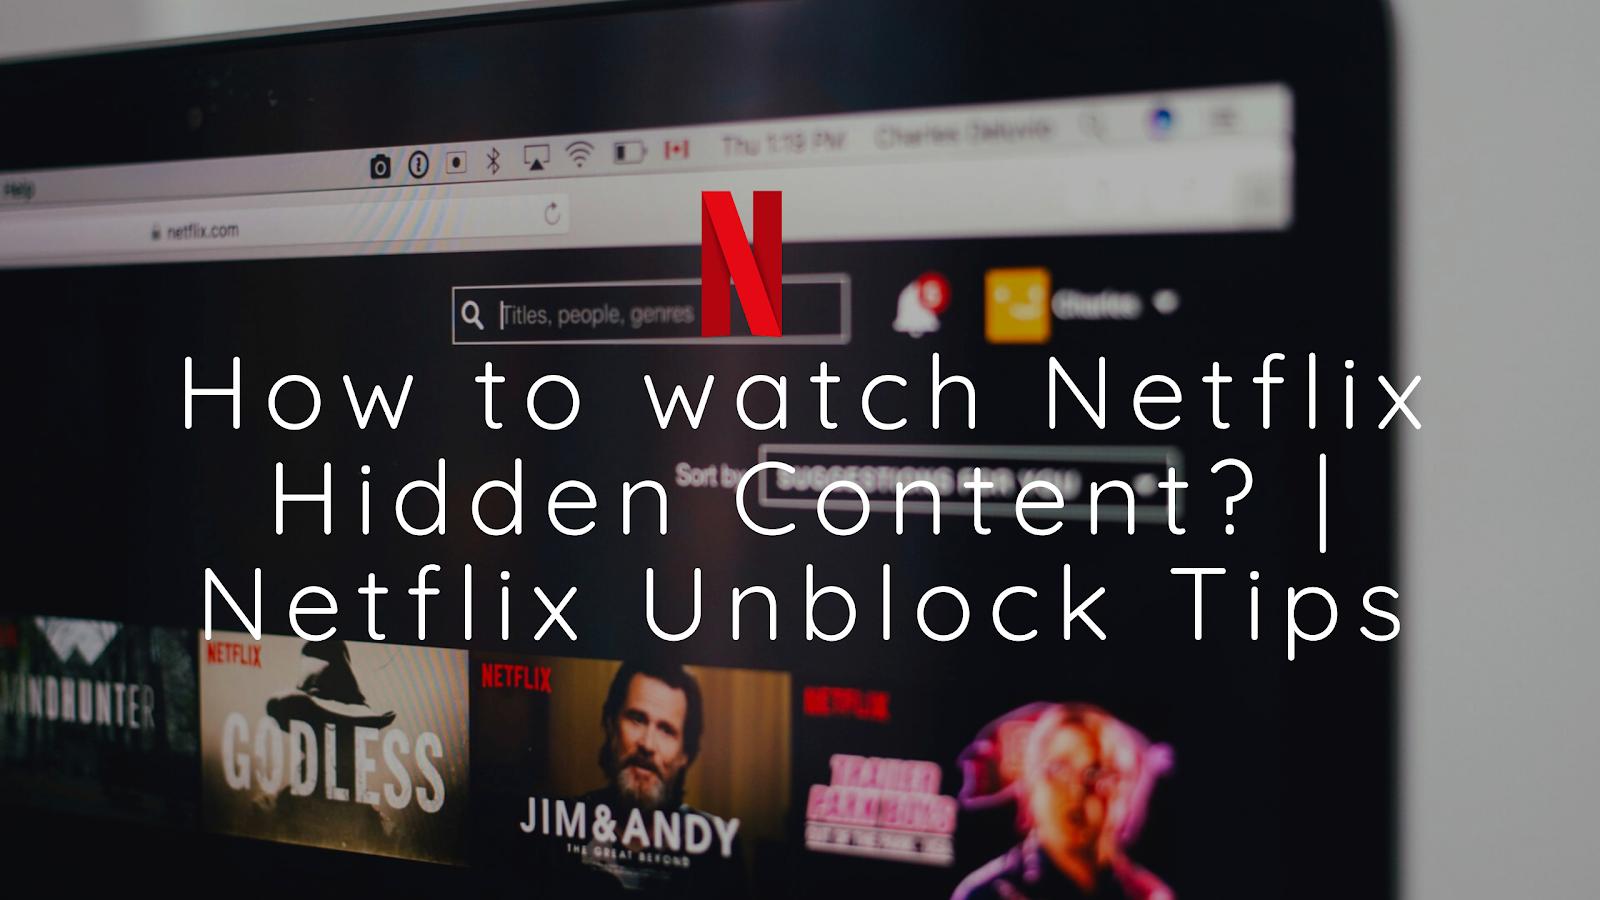 How to watch Netflix hidden content